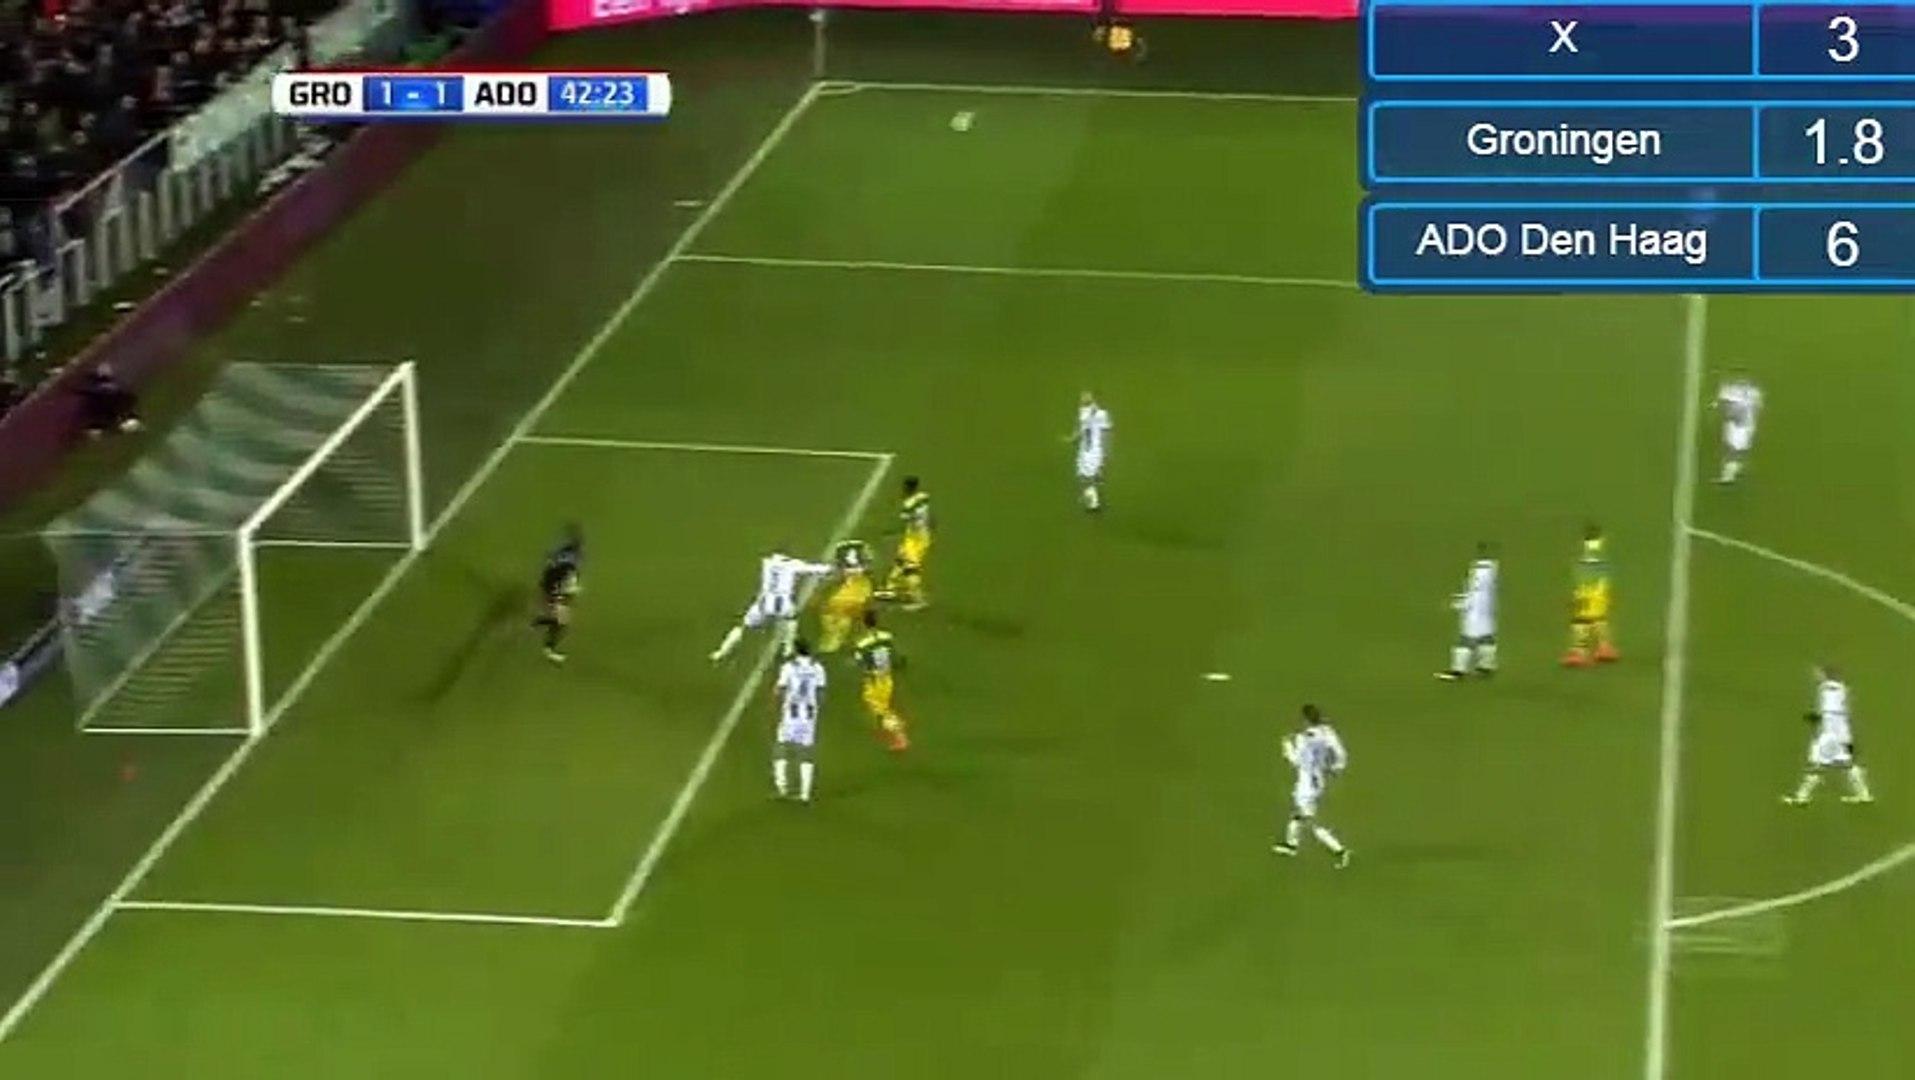 Edouard Duplan Goal Hd Groningen 1 1 Ado Den Haag 19 11 2016 Hd Video Dailymotion